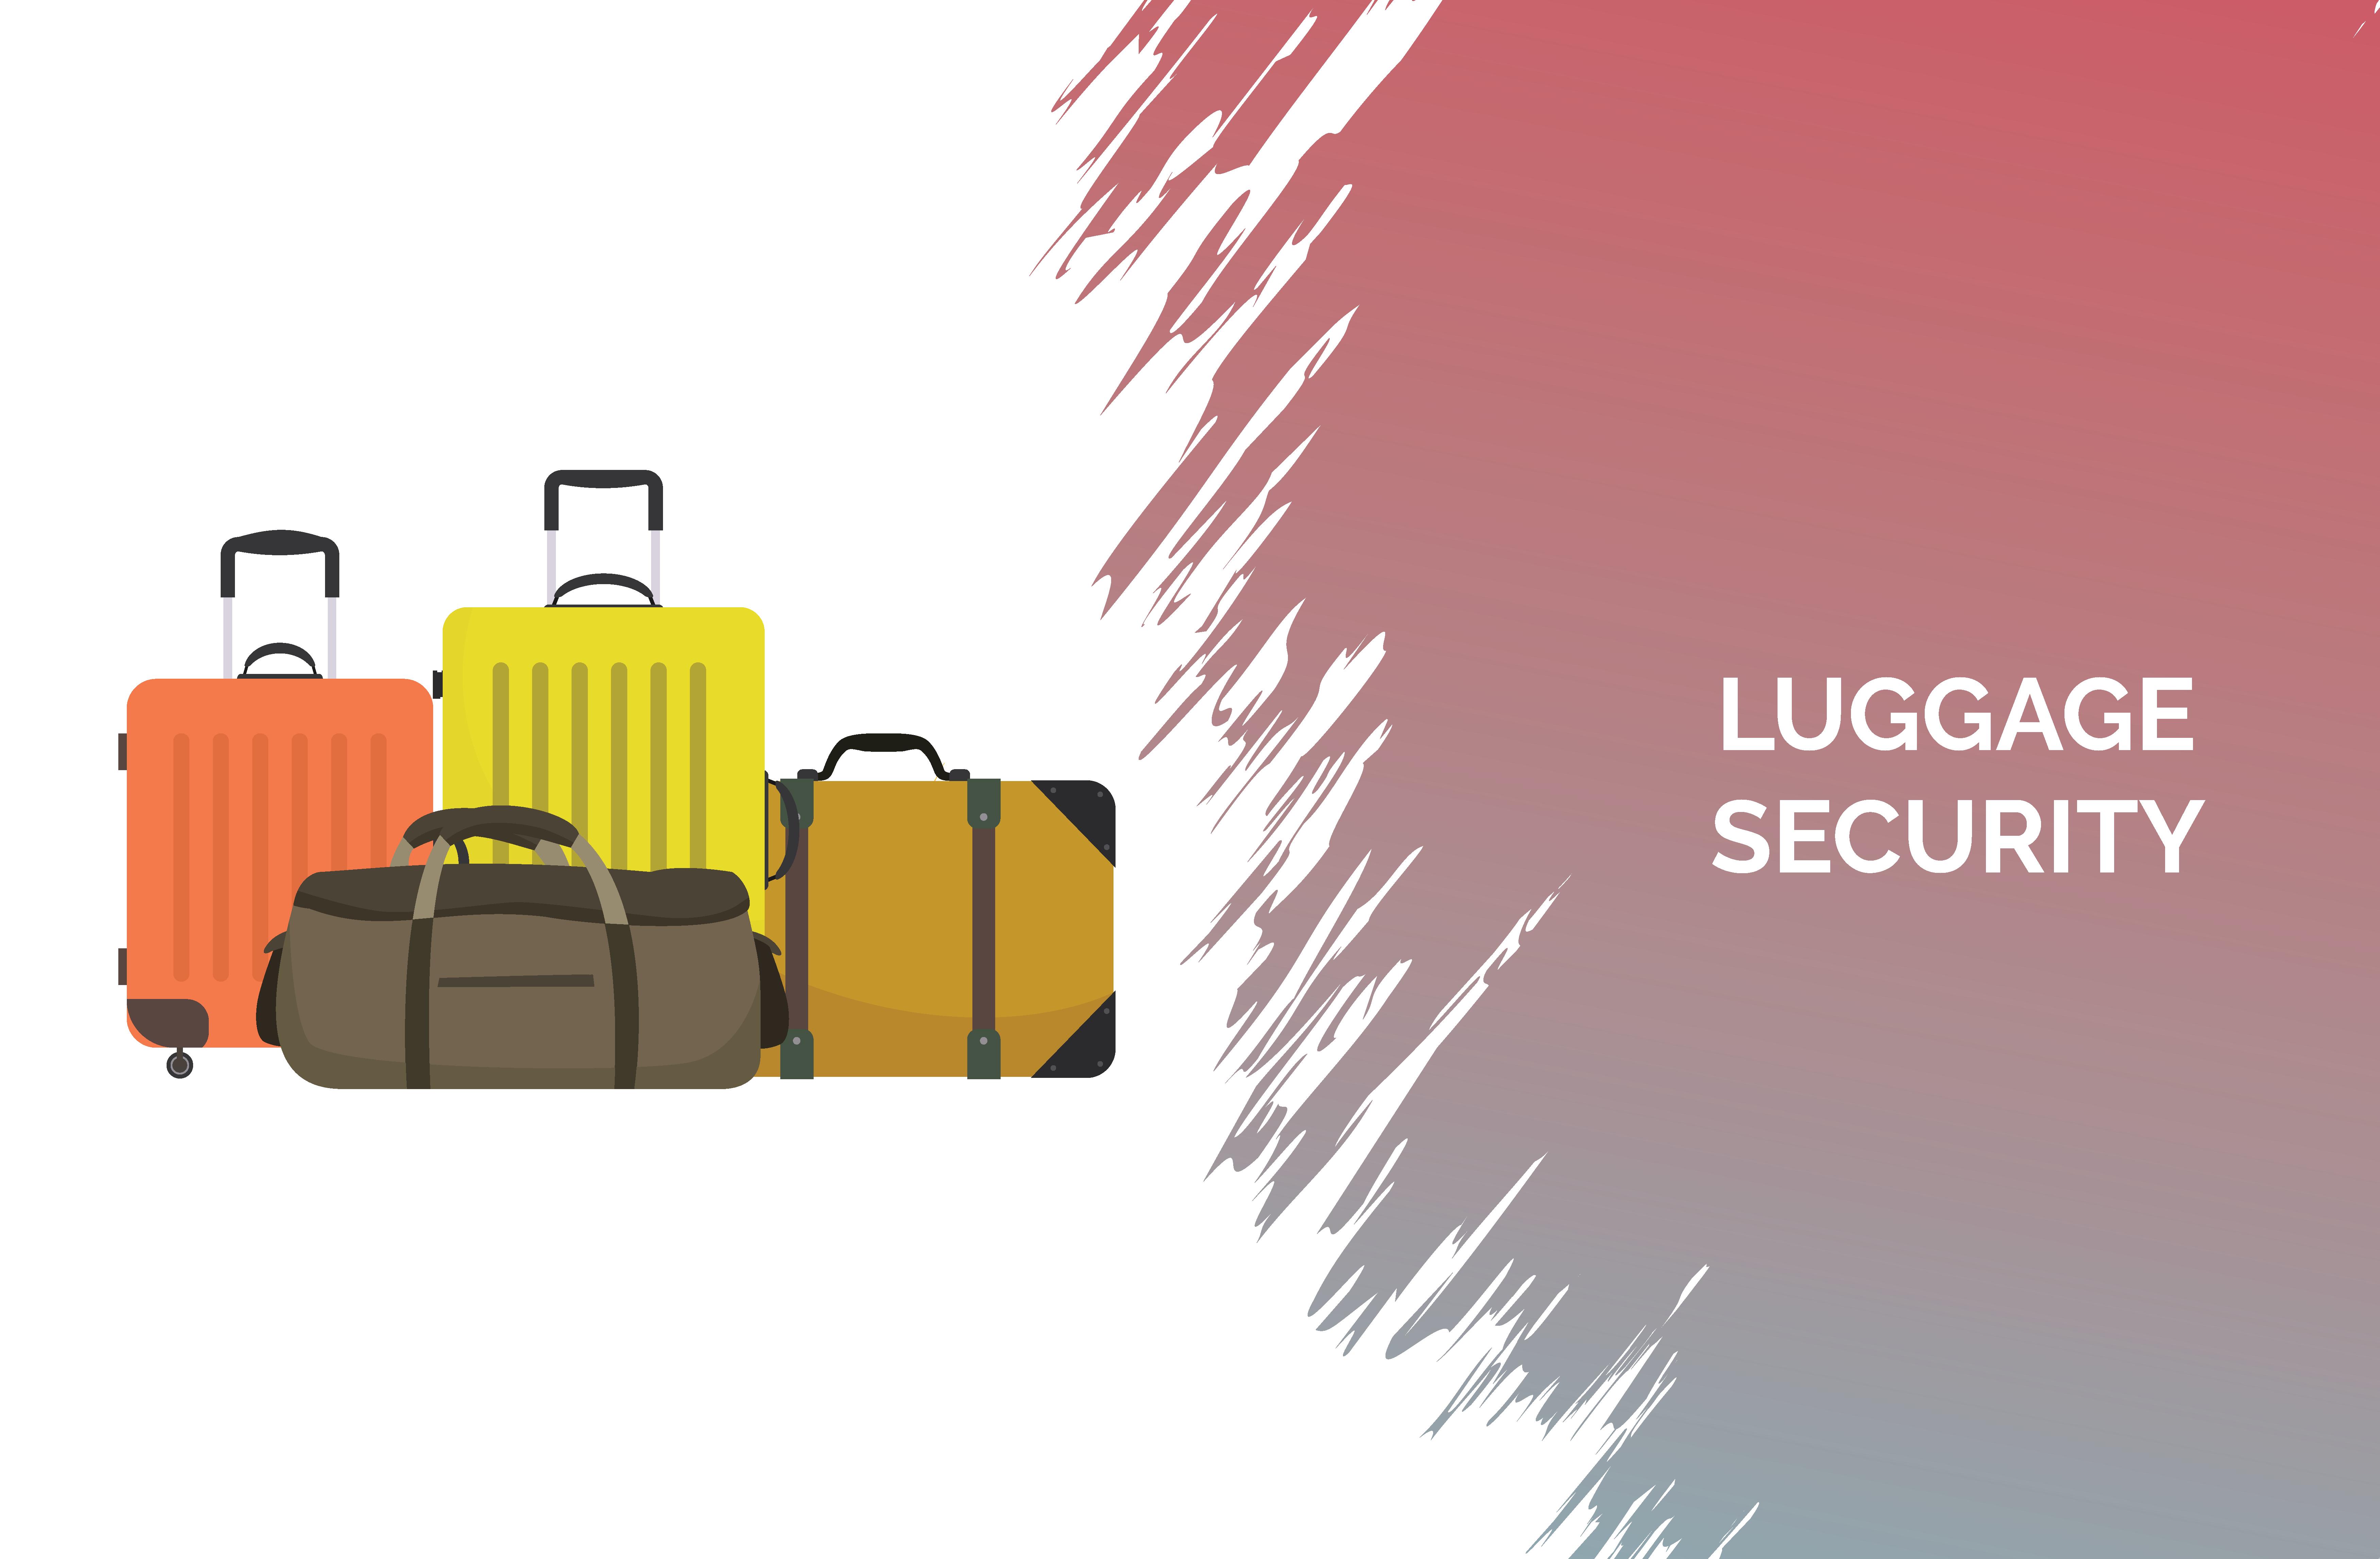 Luggage safety